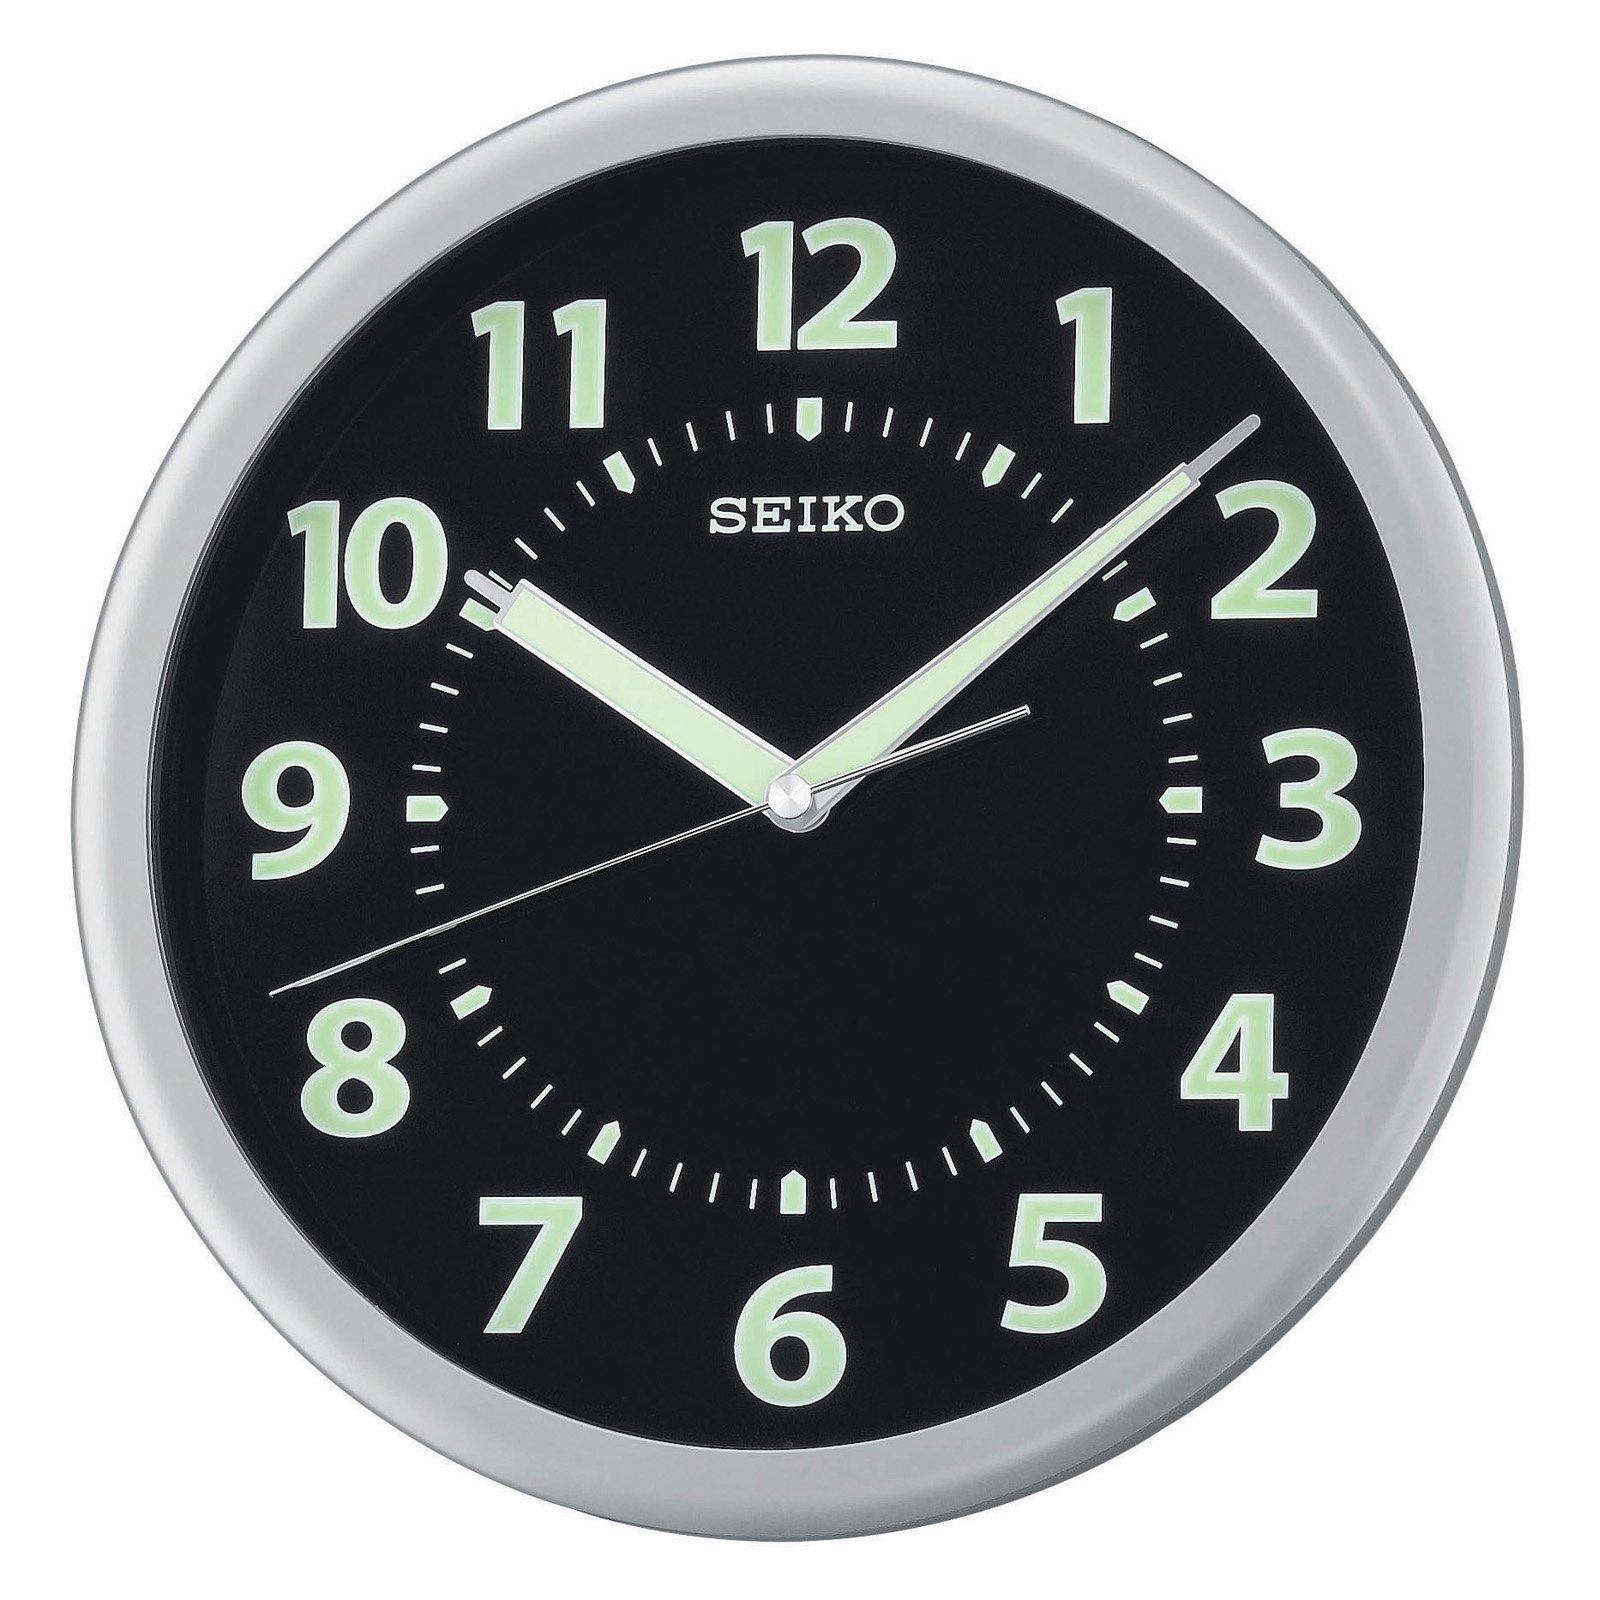 Seiko Glow In The Dark Qxa435slh 10 25 In Wall Clock 36 98 Hayneedle Black Wall Clock Wall Clock Clock